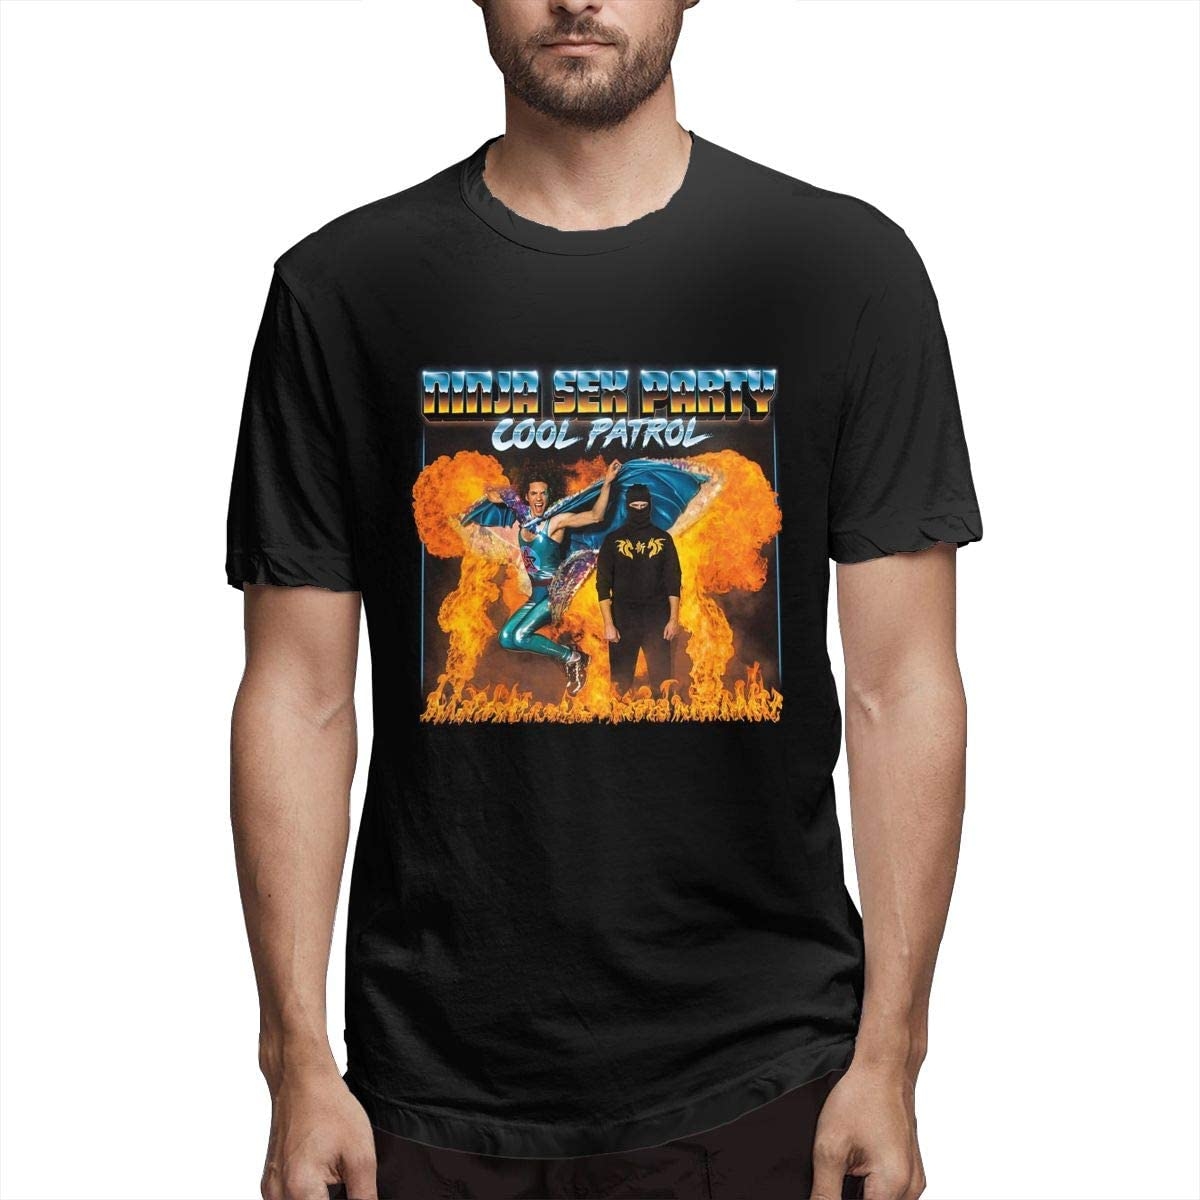 Ninja Sex Party T Shirt Men's Stylish Short Sleeves Round Neck T-Shirt